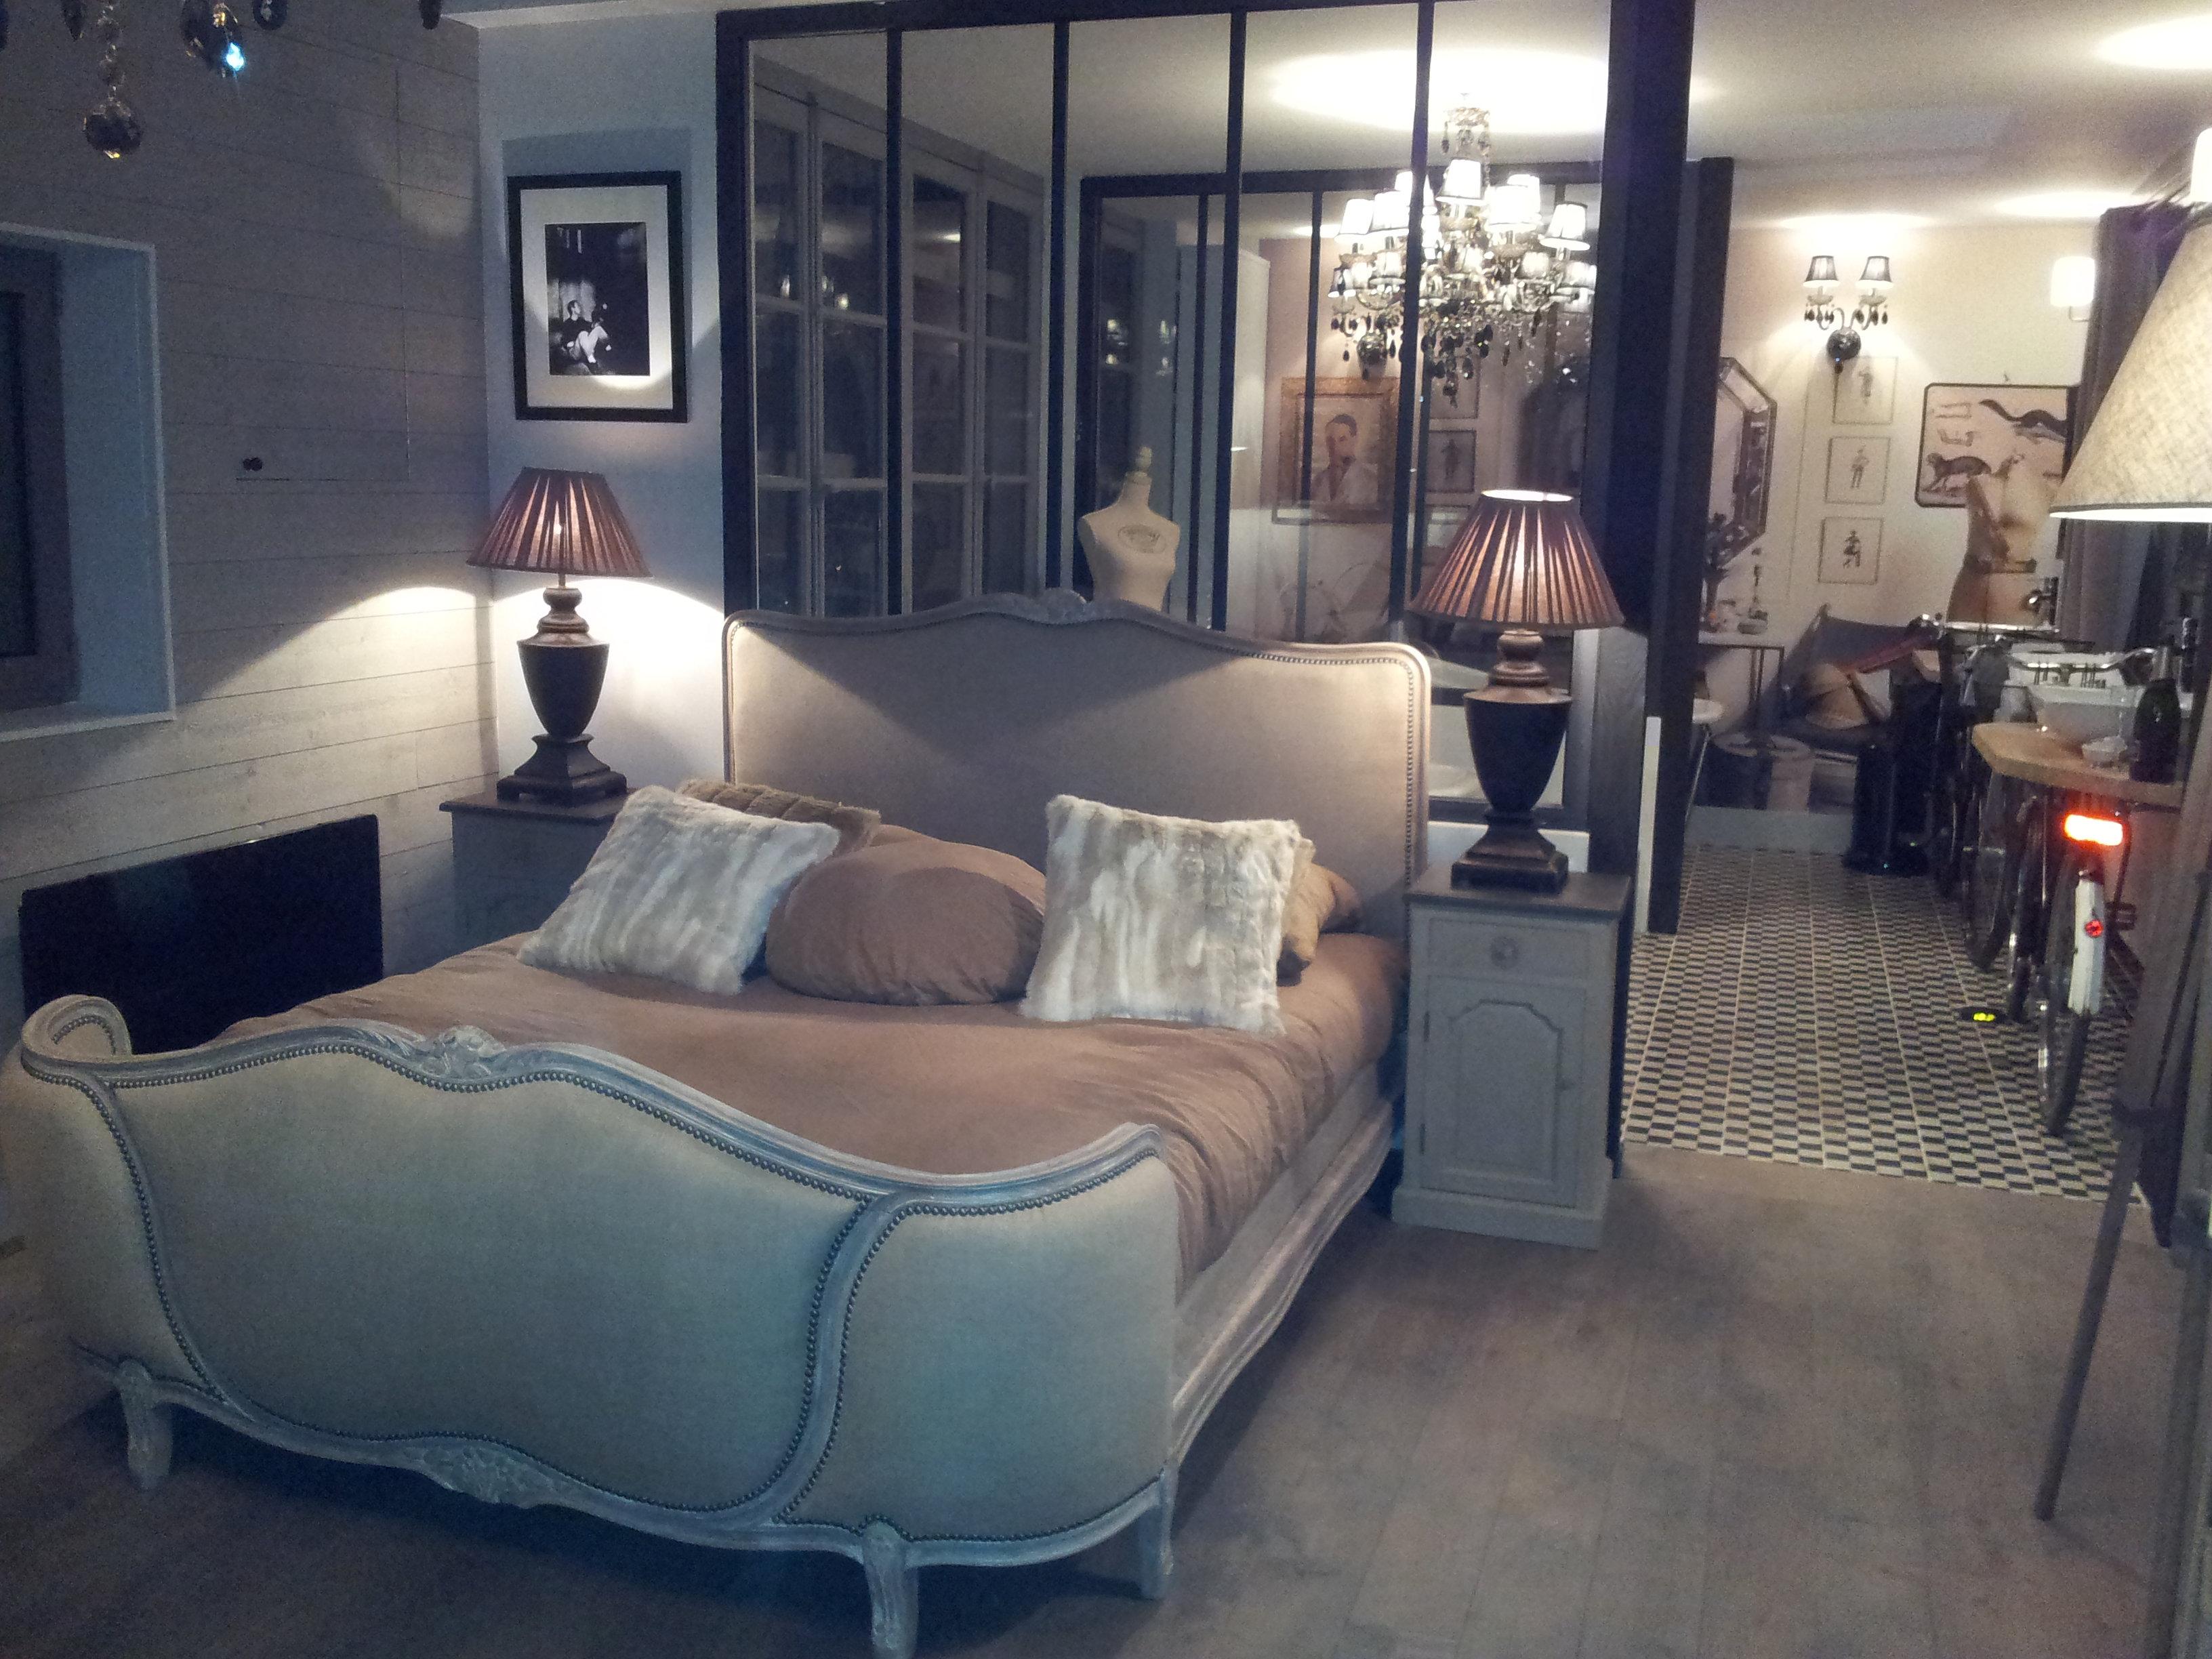 dco design tapissier decorateur lit louis xv tissu lin. Black Bedroom Furniture Sets. Home Design Ideas